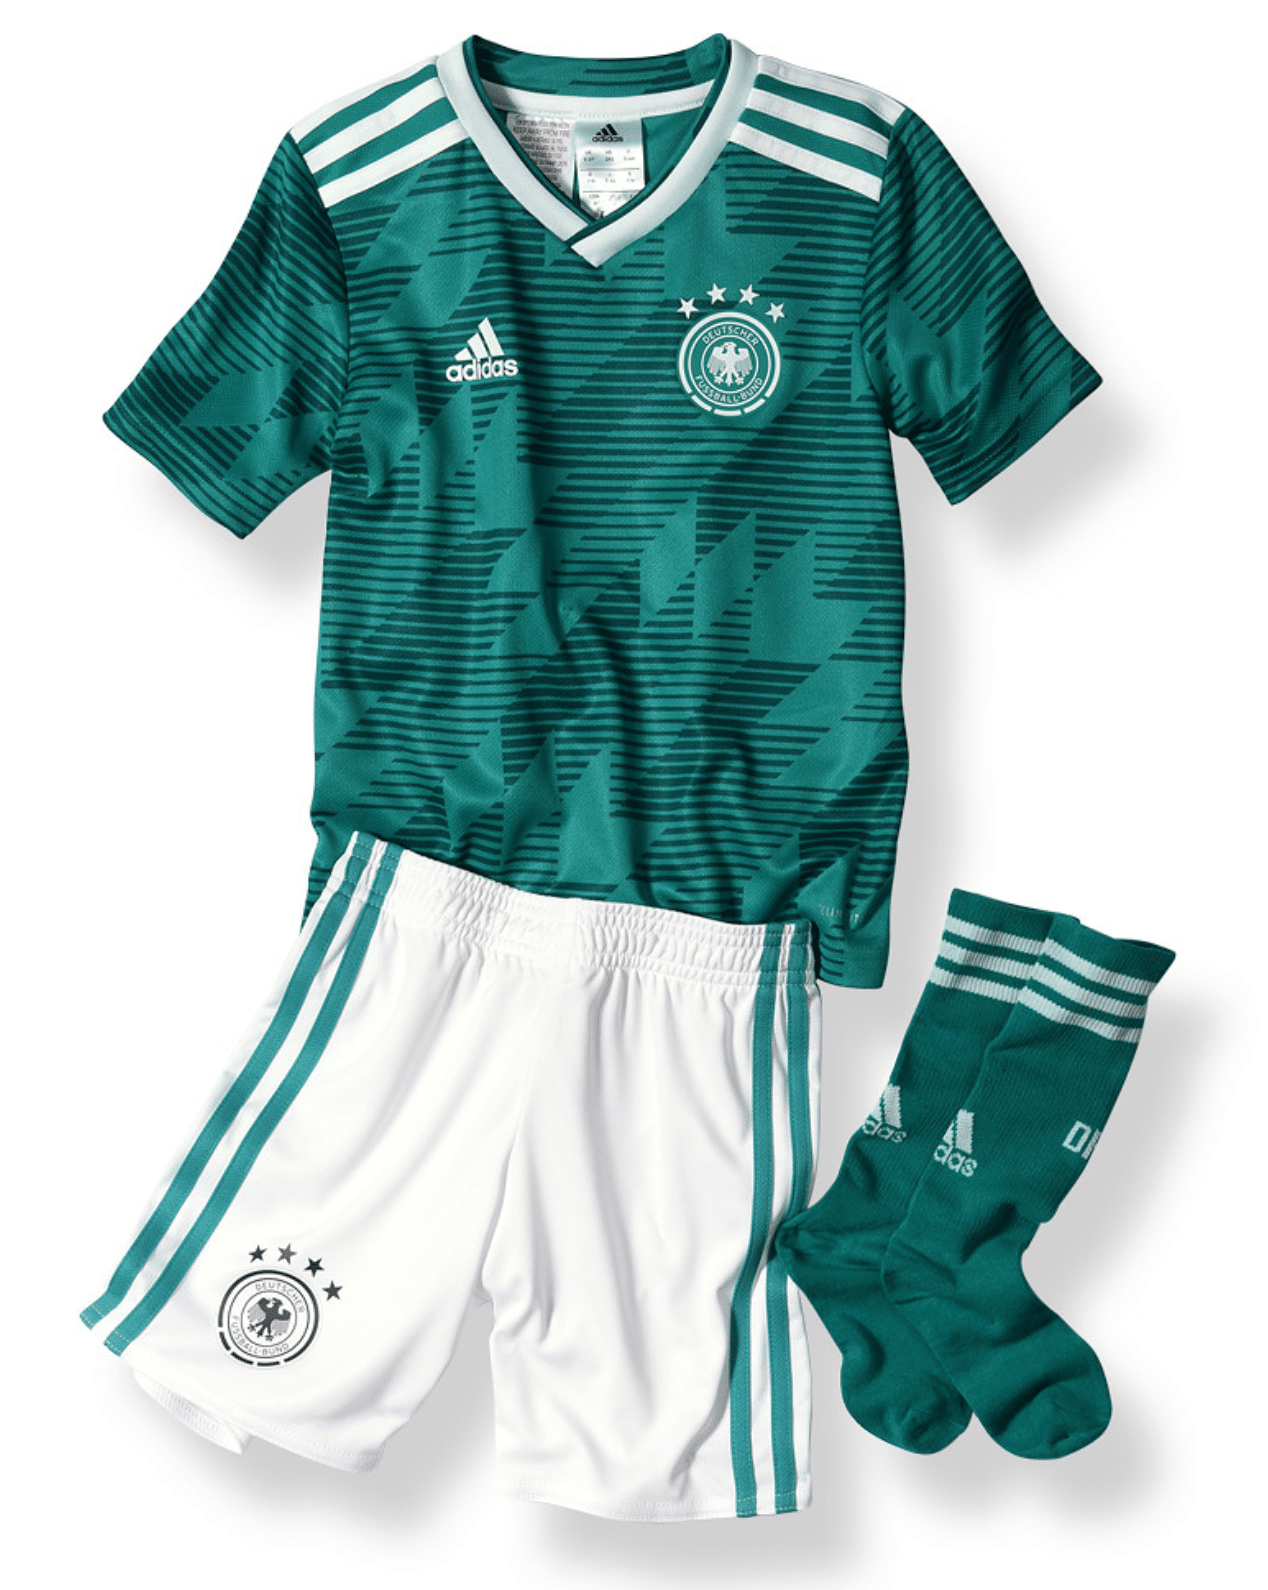 new appearance latest discount half off DFB Trikot Beflockung: Deutschland Trikot mit eigenem Namen ...